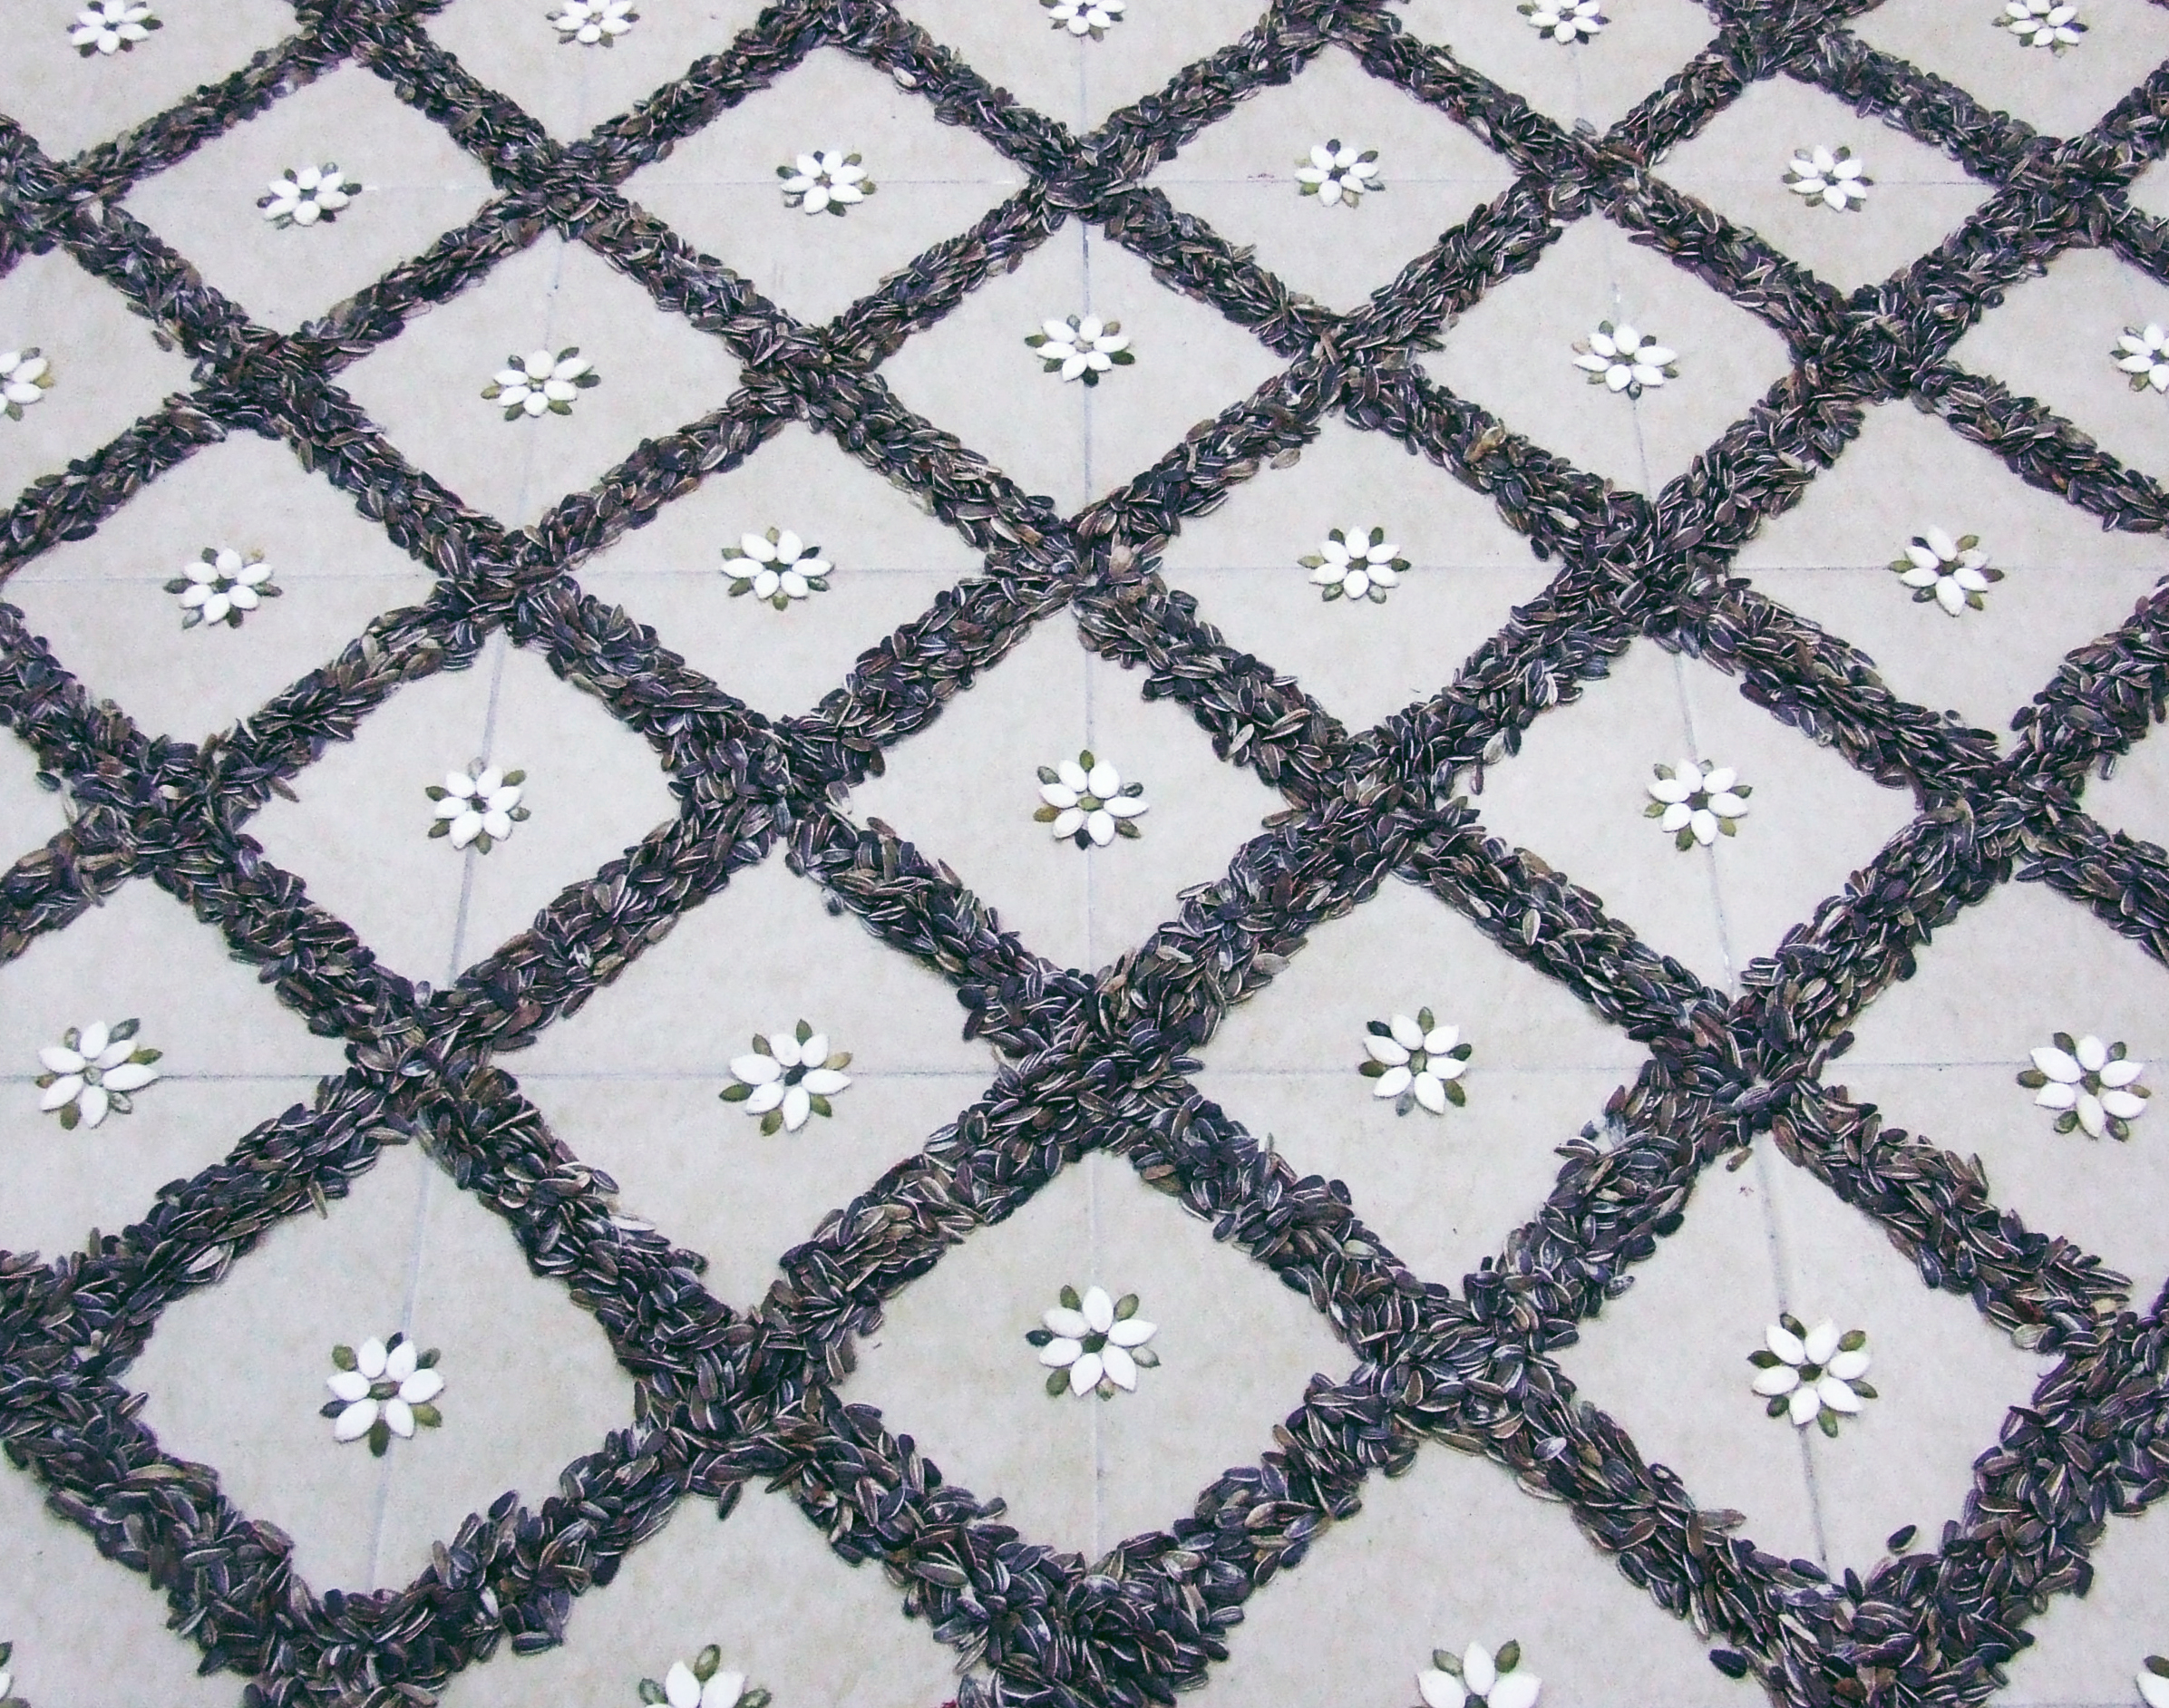 Seeds floor_5_Shahar Tuchner.jpg